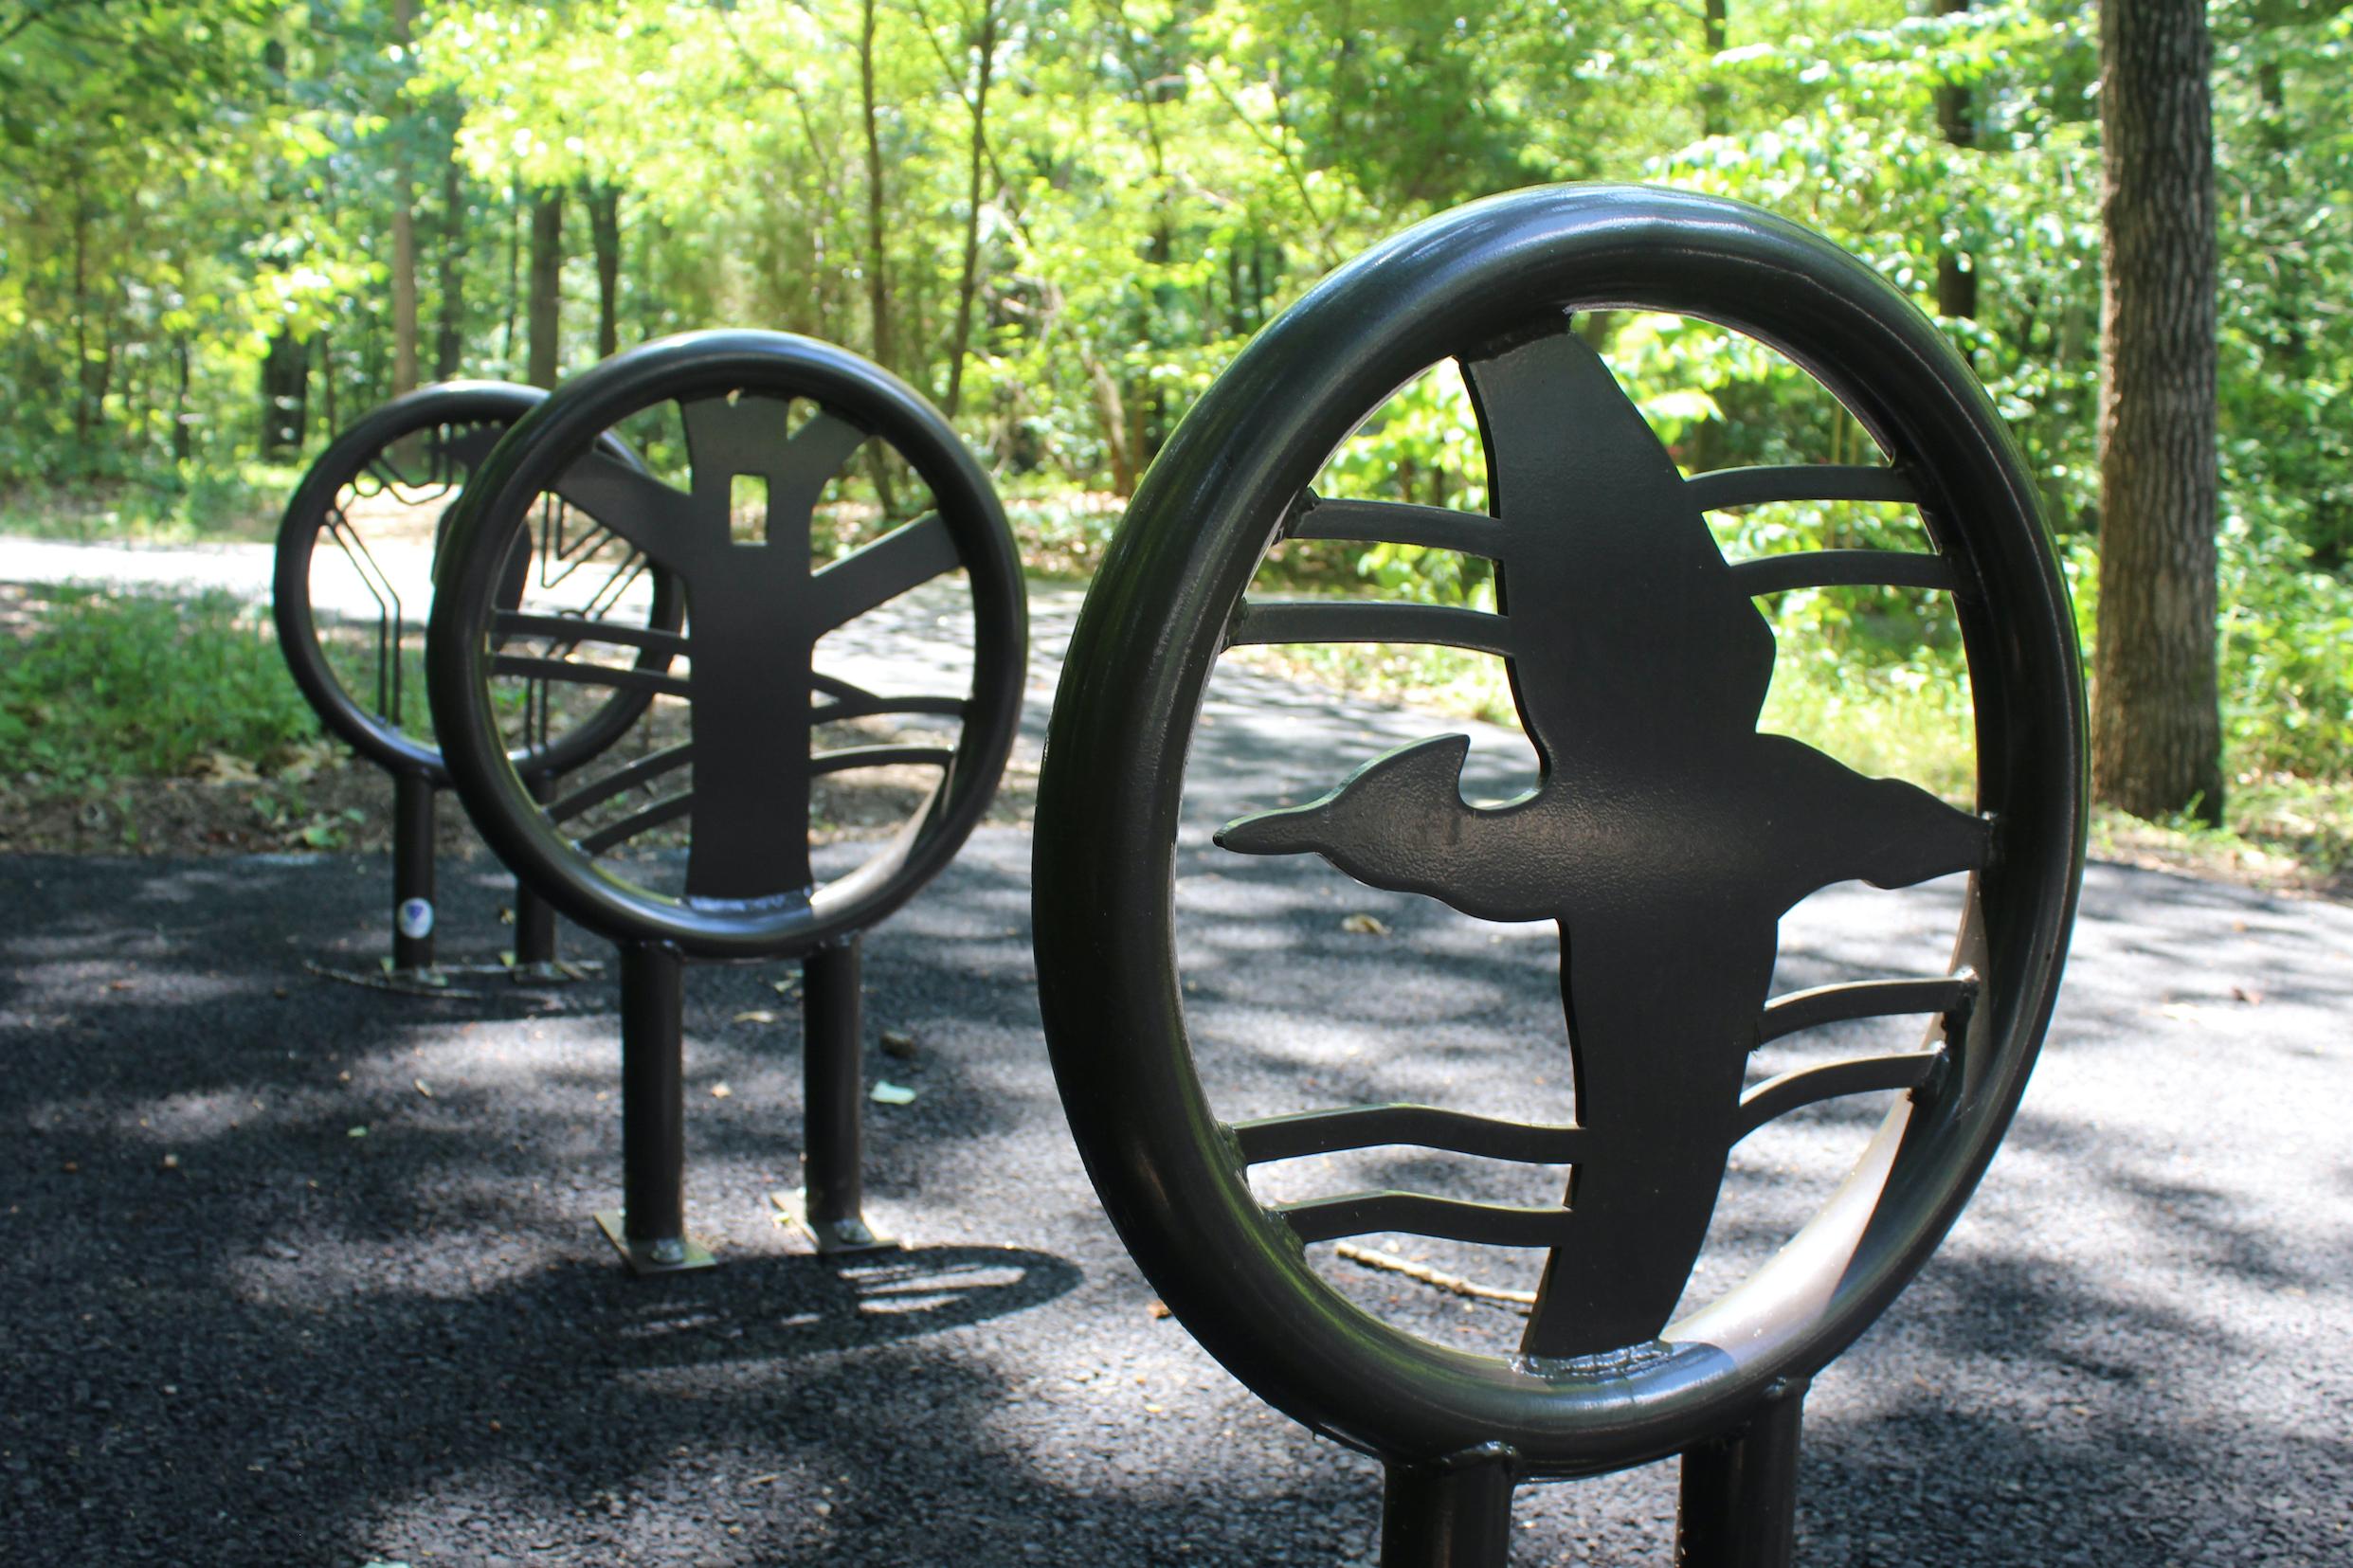 Pileated Woodpecker – Bicycle Racks